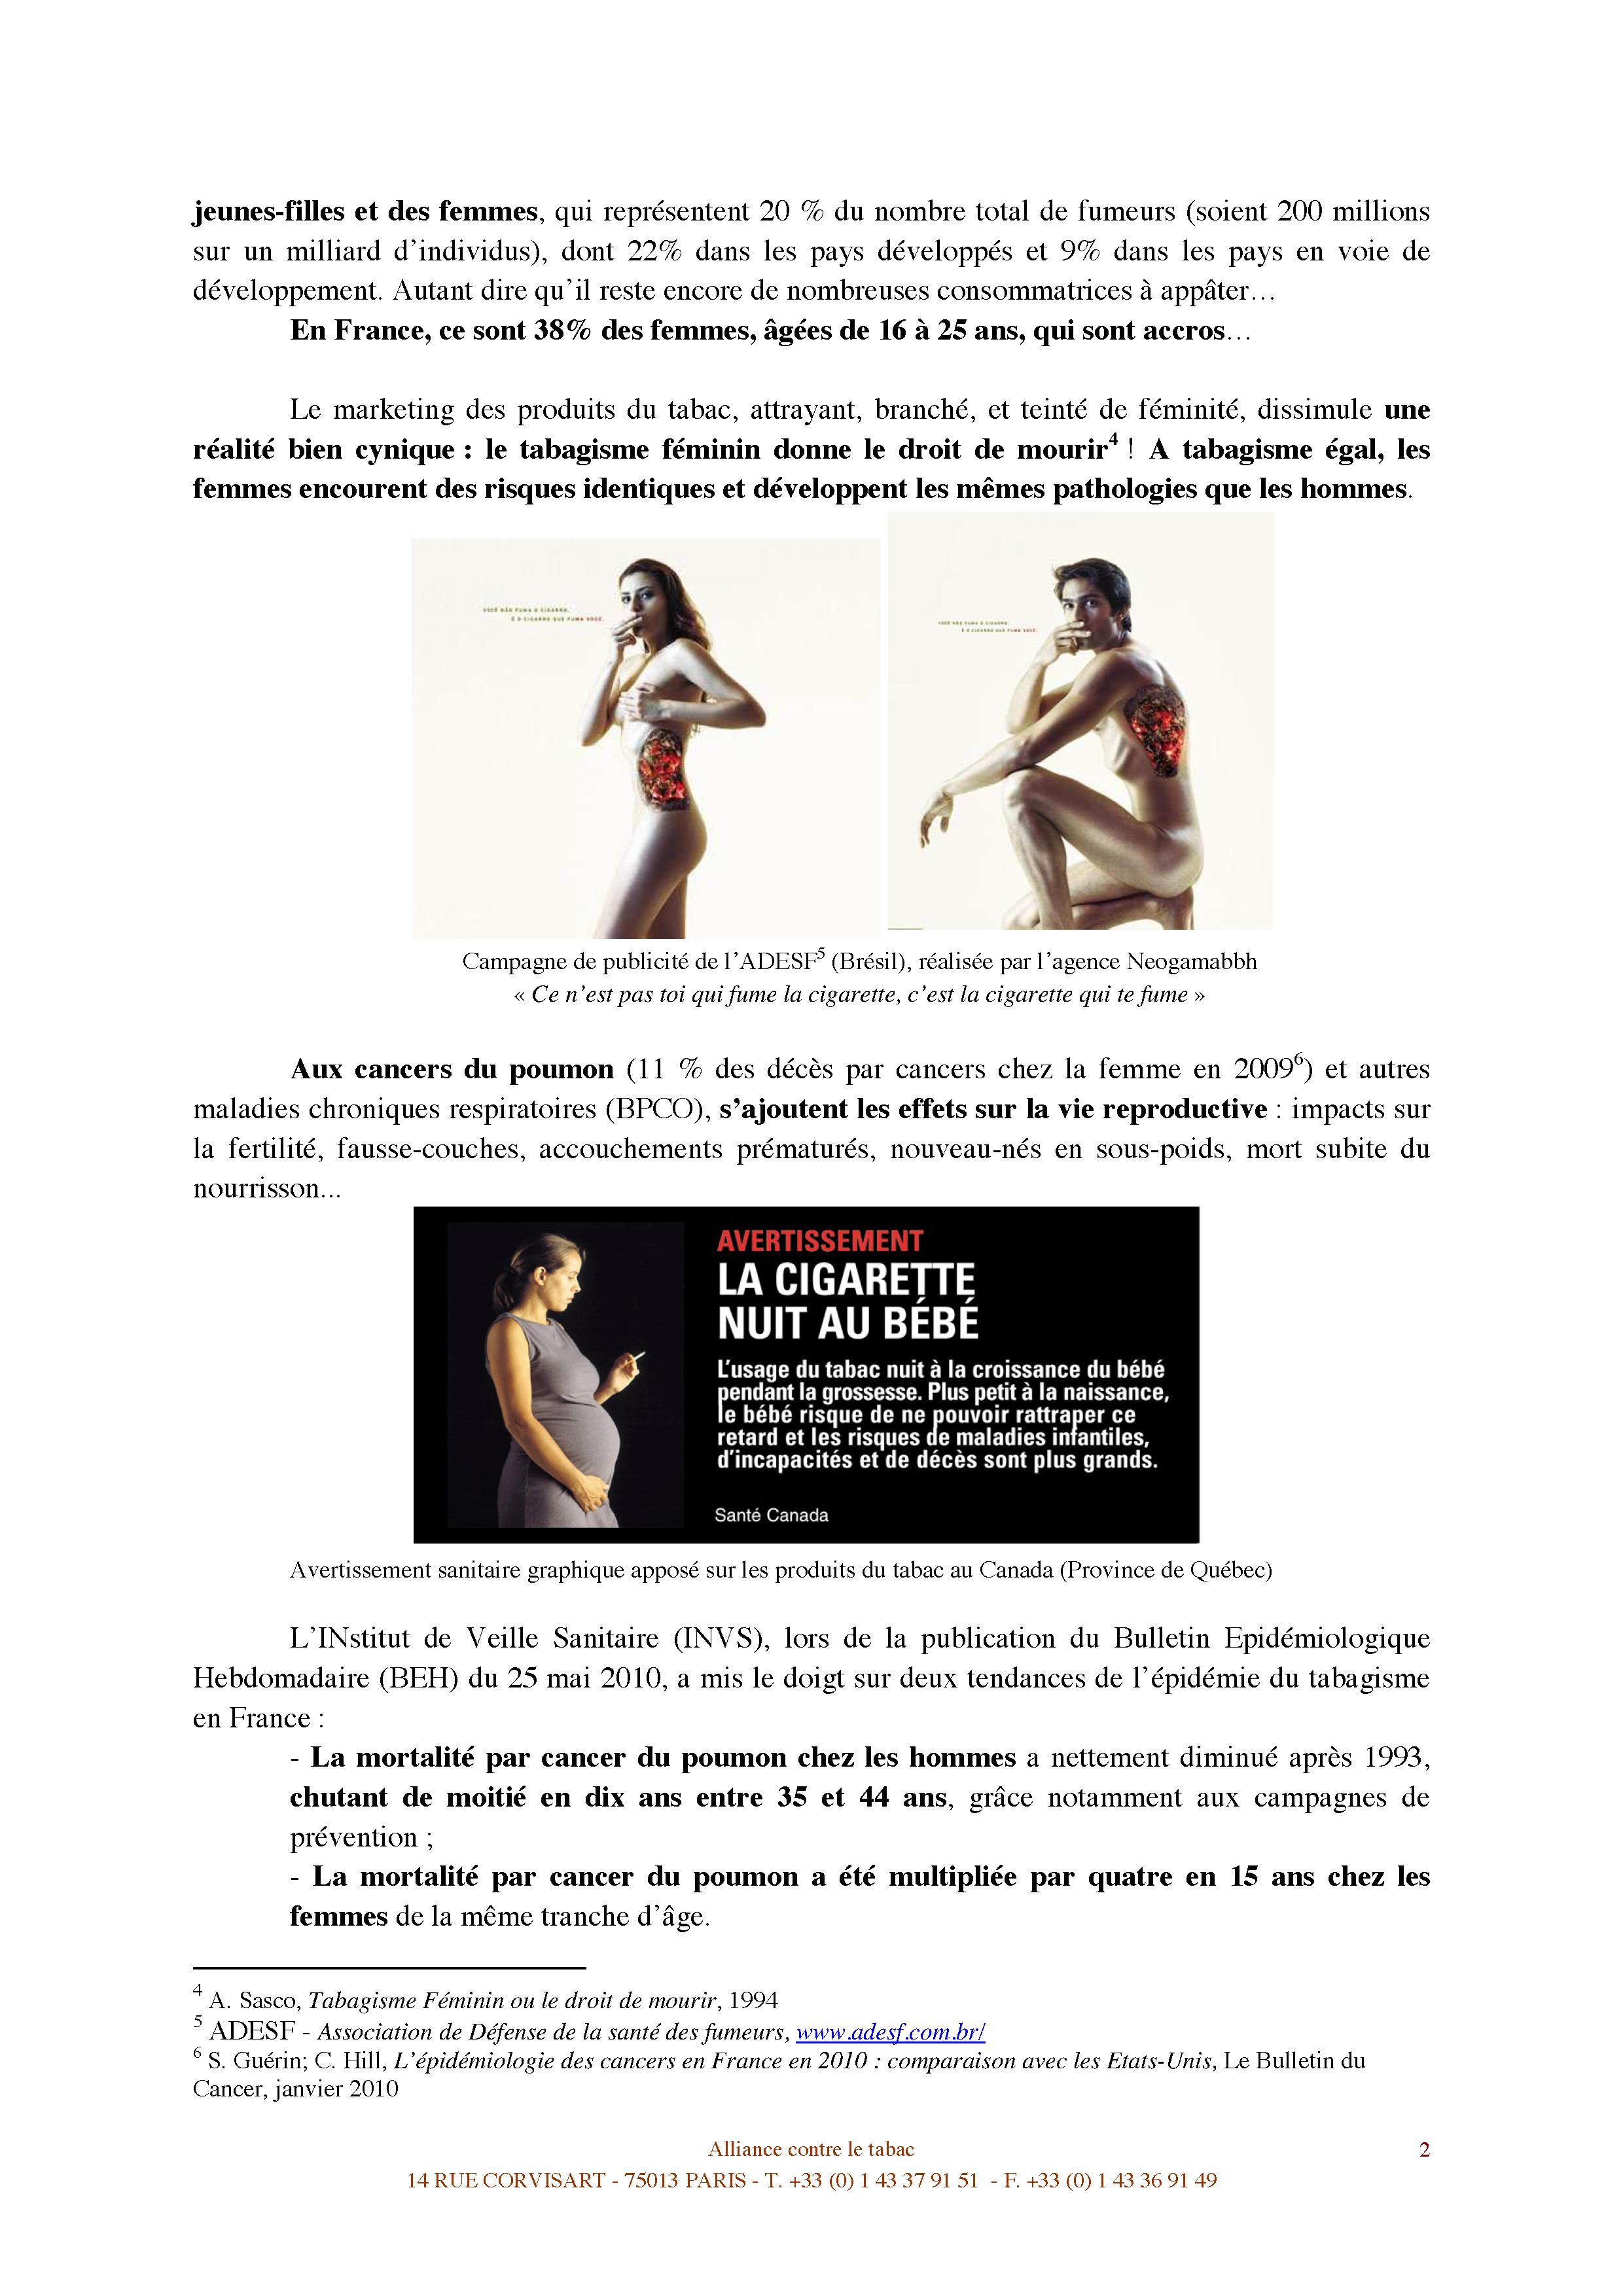 Alliance-CP_JMST-2010-tabagisme-au-feminin-vers-une-parite-qui-tue-27mai2010_Page_2.jpg